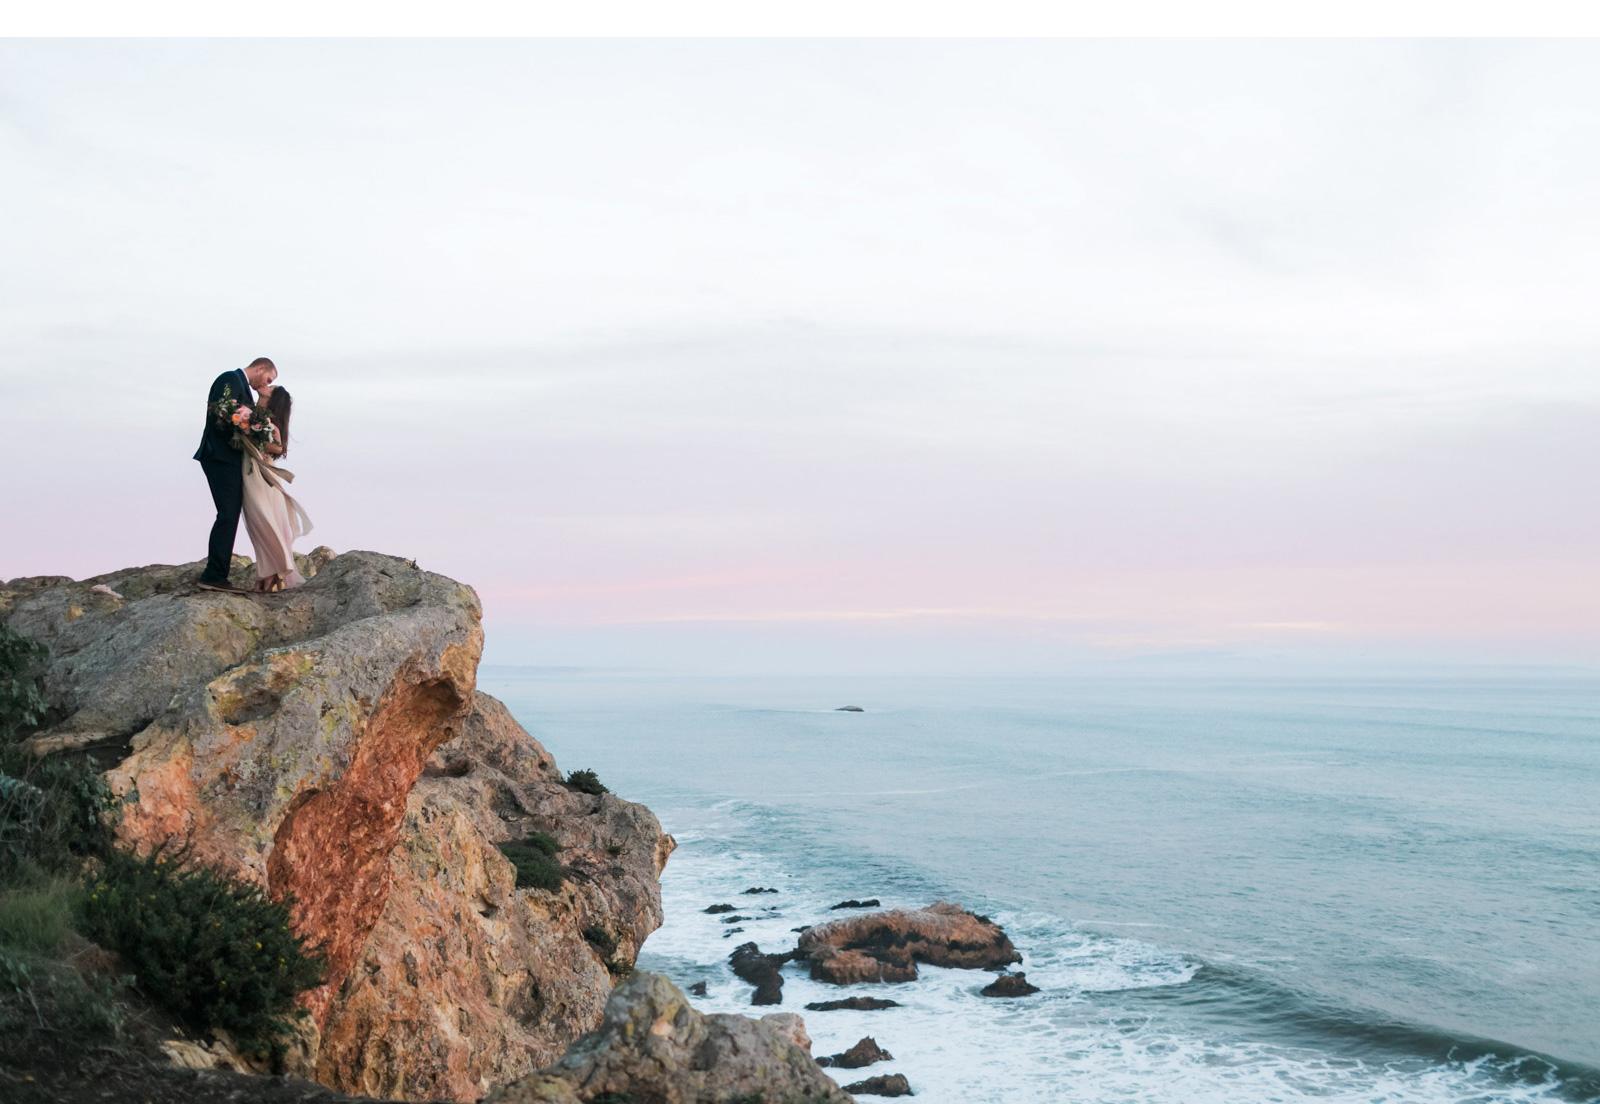 Central-Coast-Wedding-Photographer-Natalie-Schutt-Photography_03.jpg